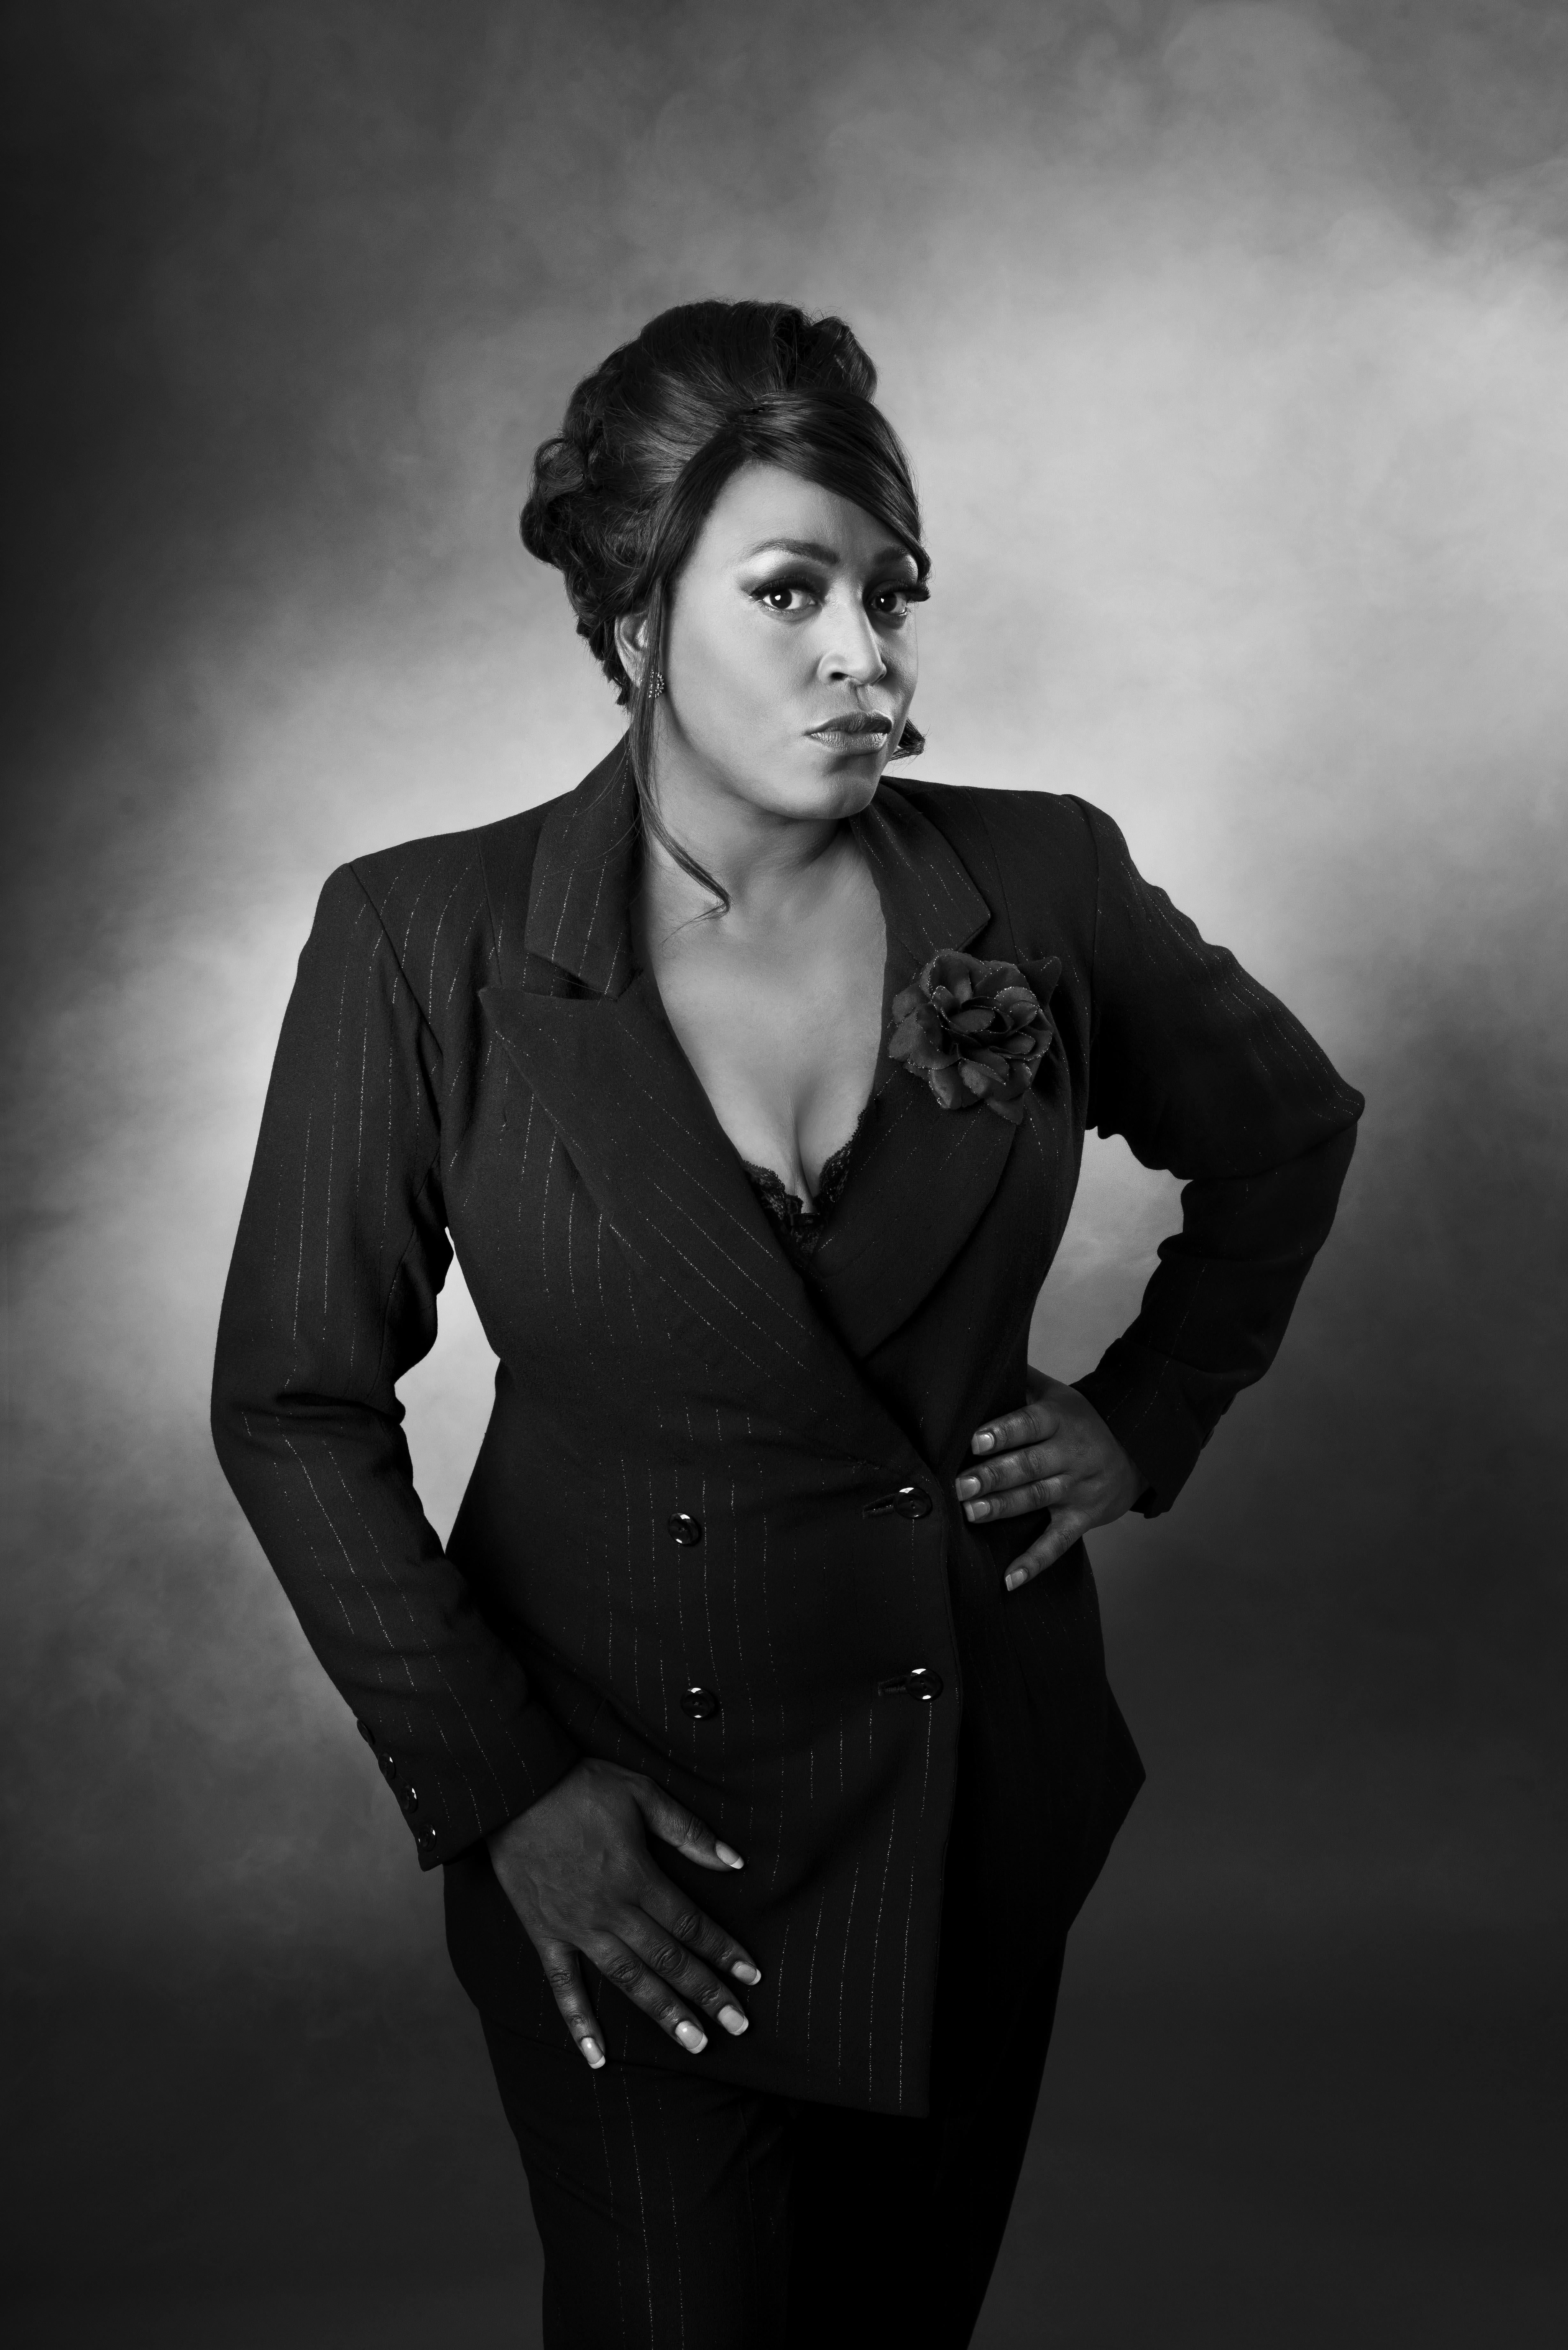 CHICAGO - Mica Paris as 'Mama Morton'. Image by Dewynters